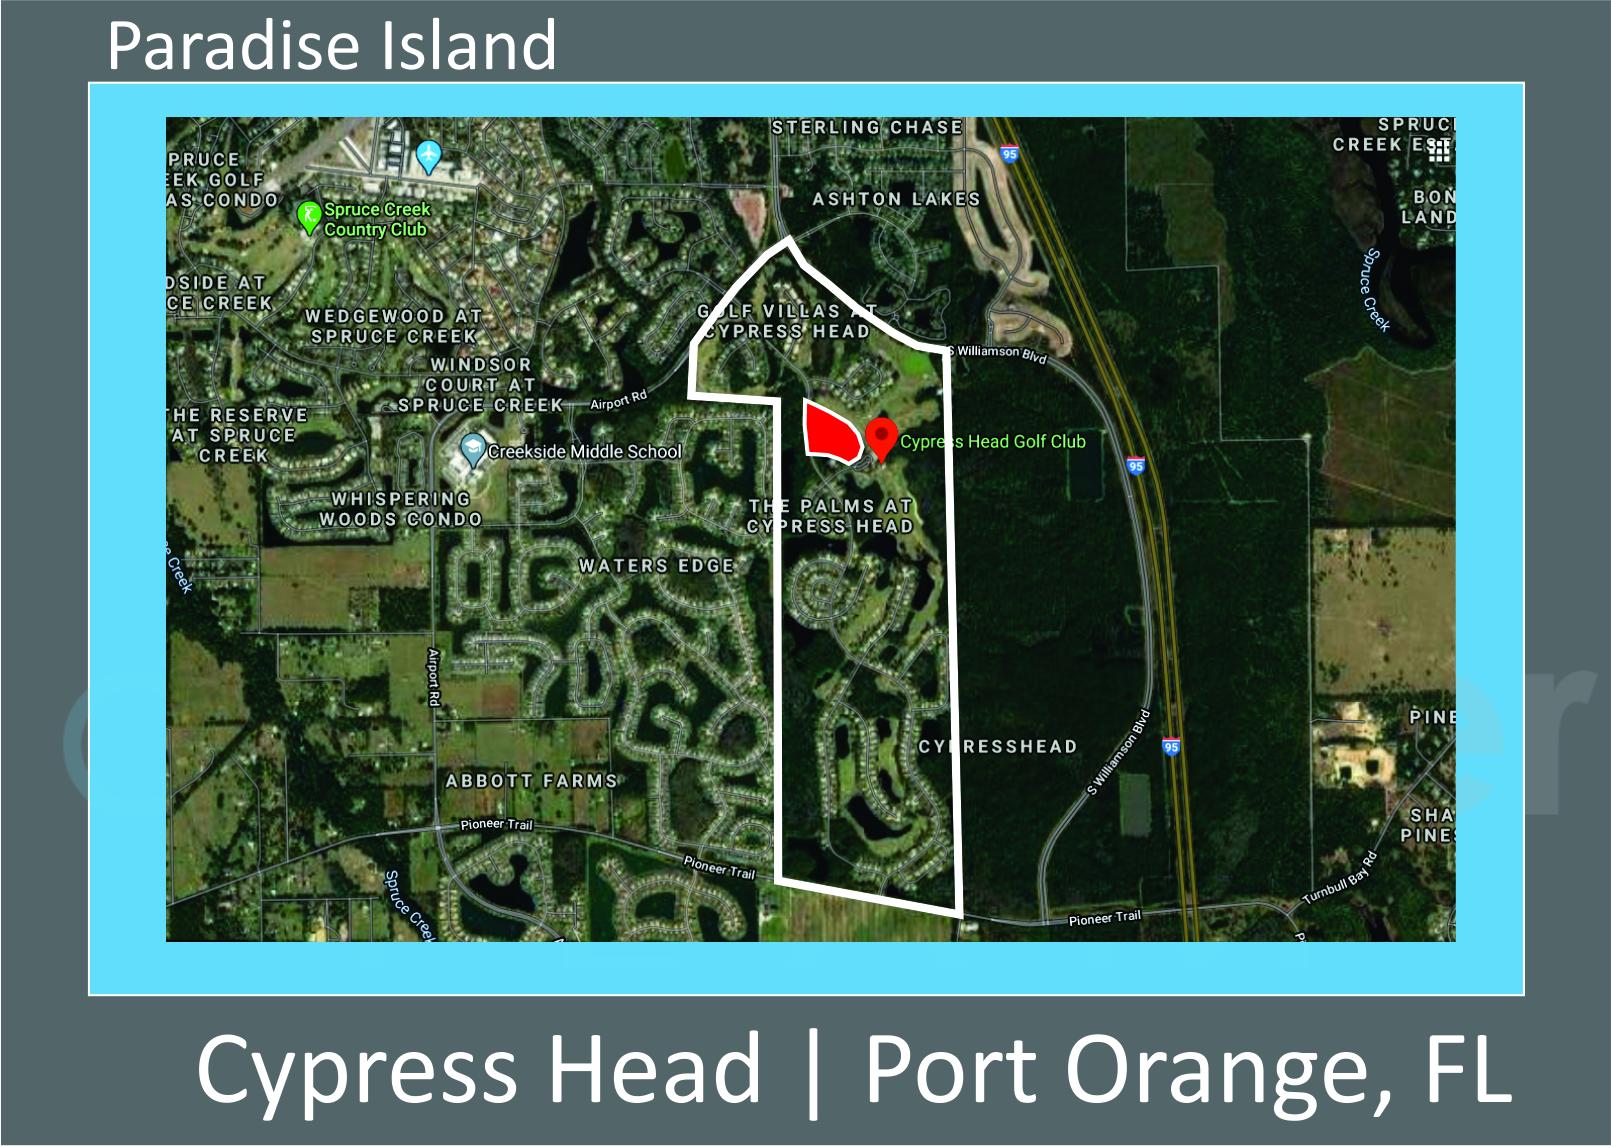 Map of Cypress Head Paradise Island Port Orange FL